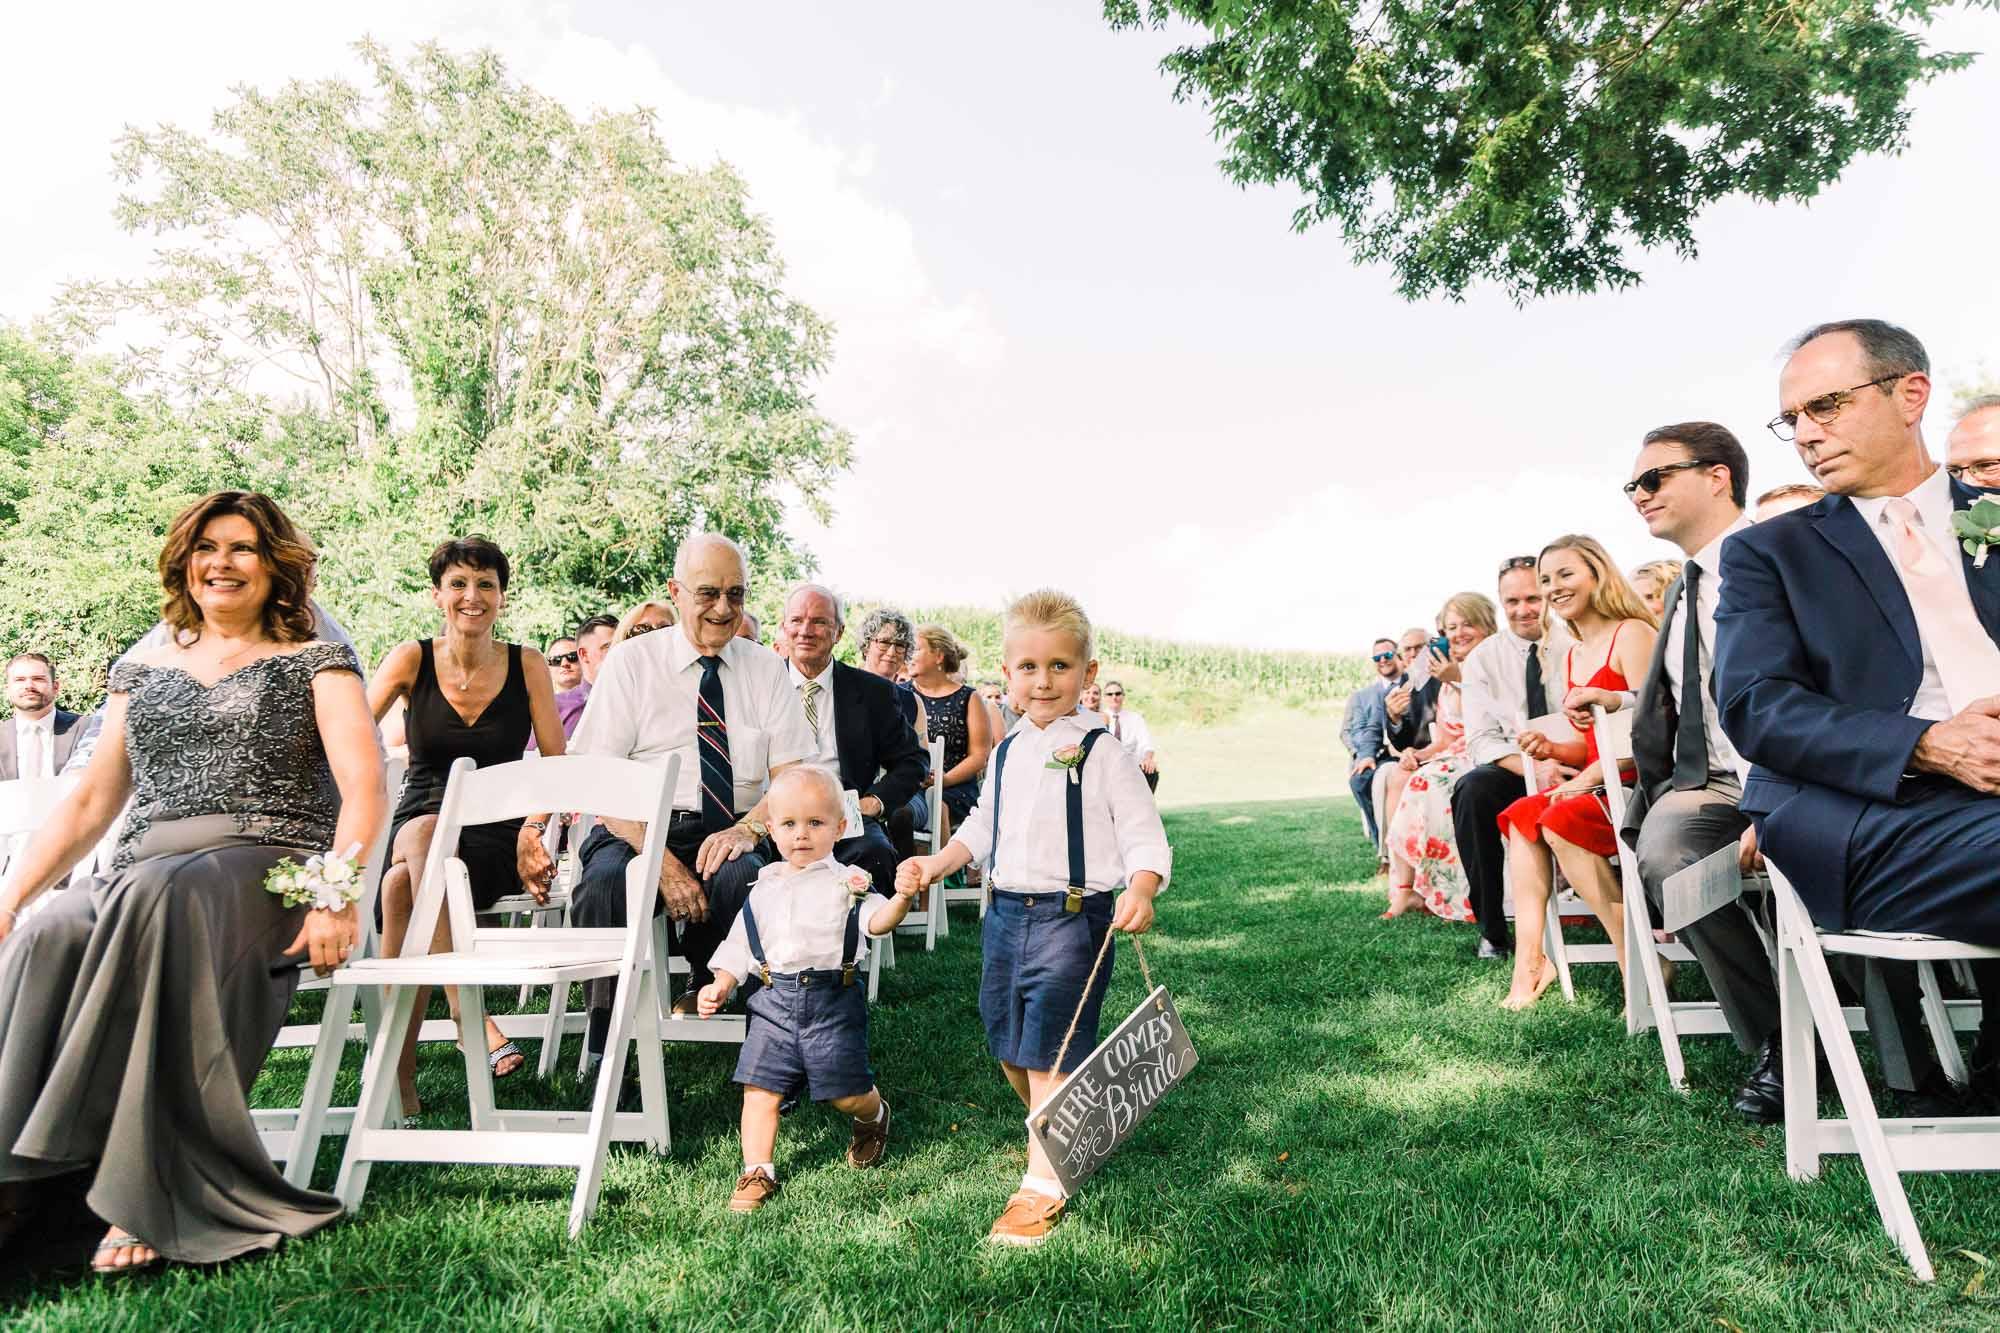 the-farm-at-eagles-ridge-lancaster-wedding-9842.jpg